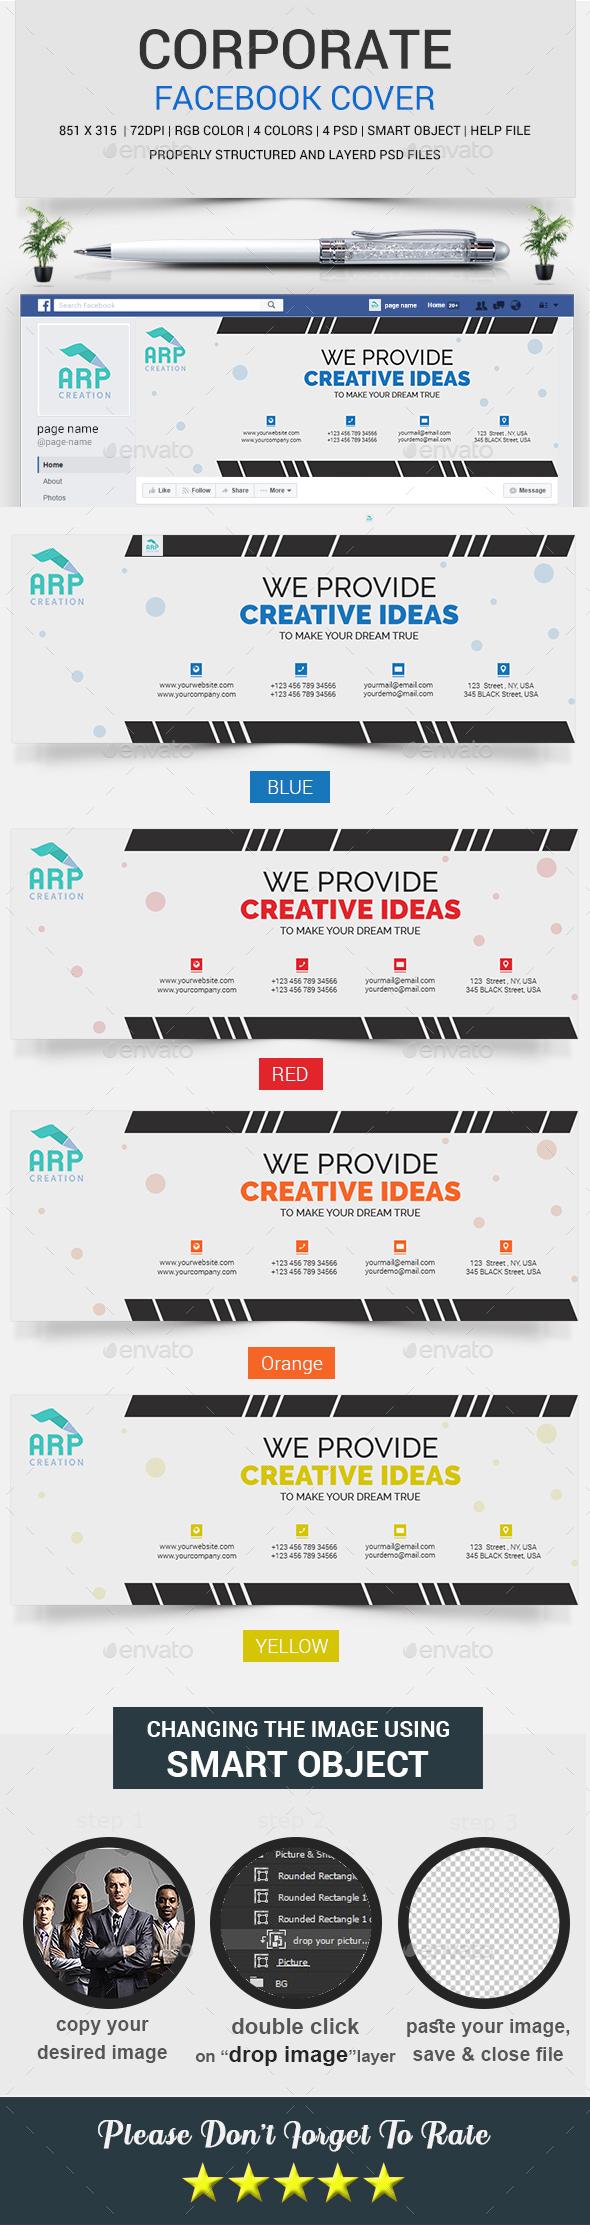 Corporate FB Timeline Cover - Facebook Timeline Covers Social Media